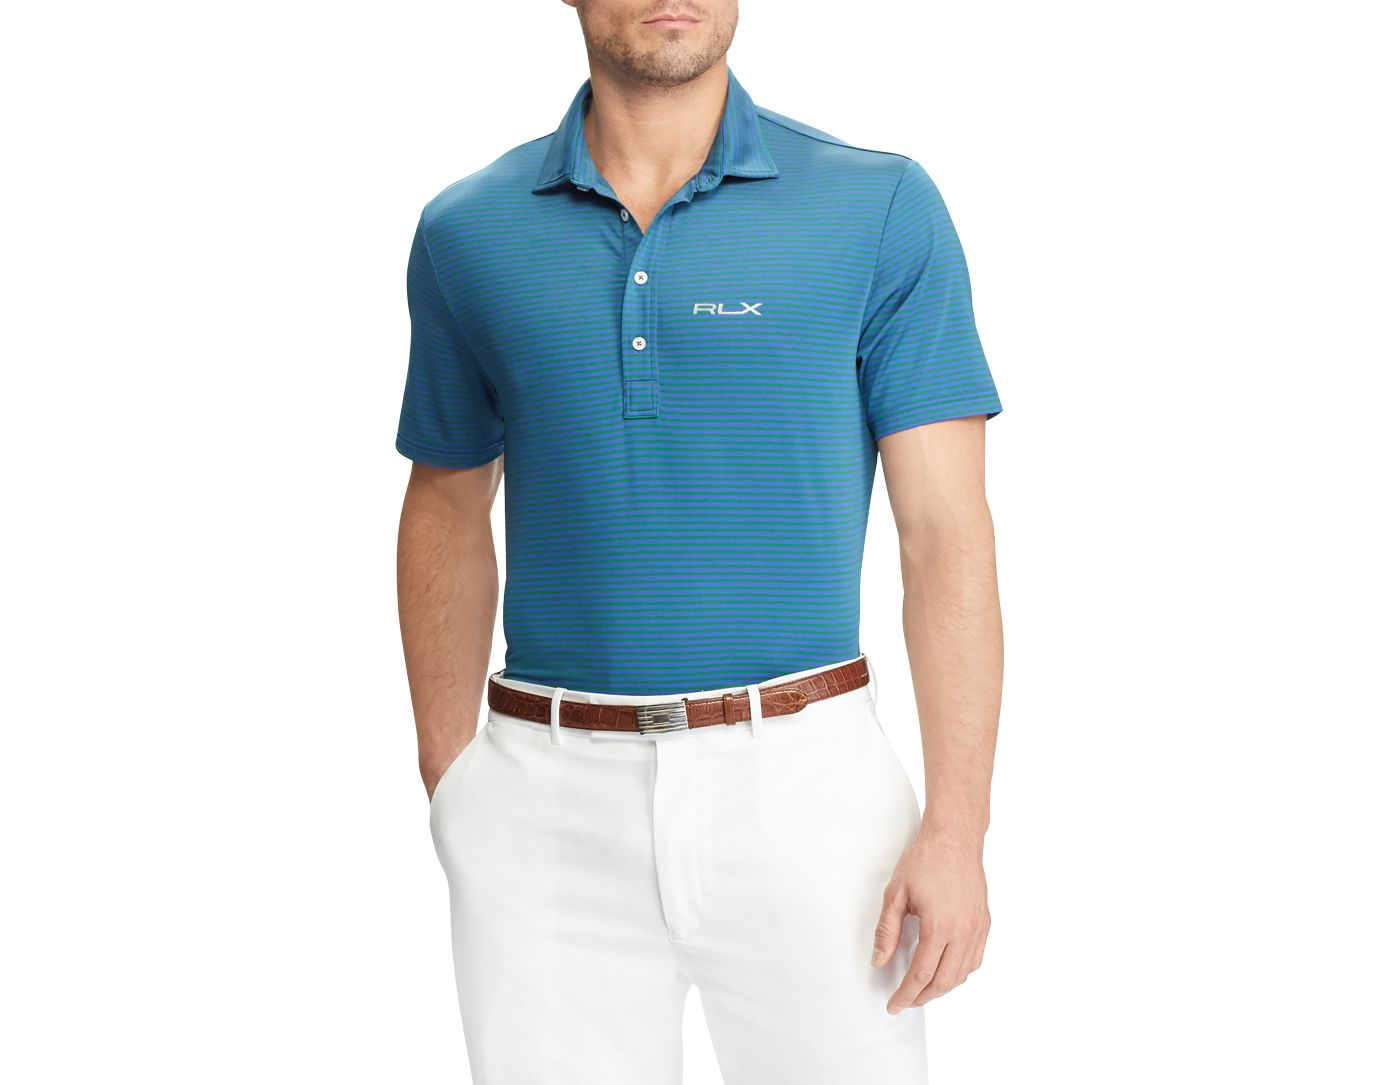 RLX Golf Men's Short Sleeve Striped Airflow Performance Golf Polo